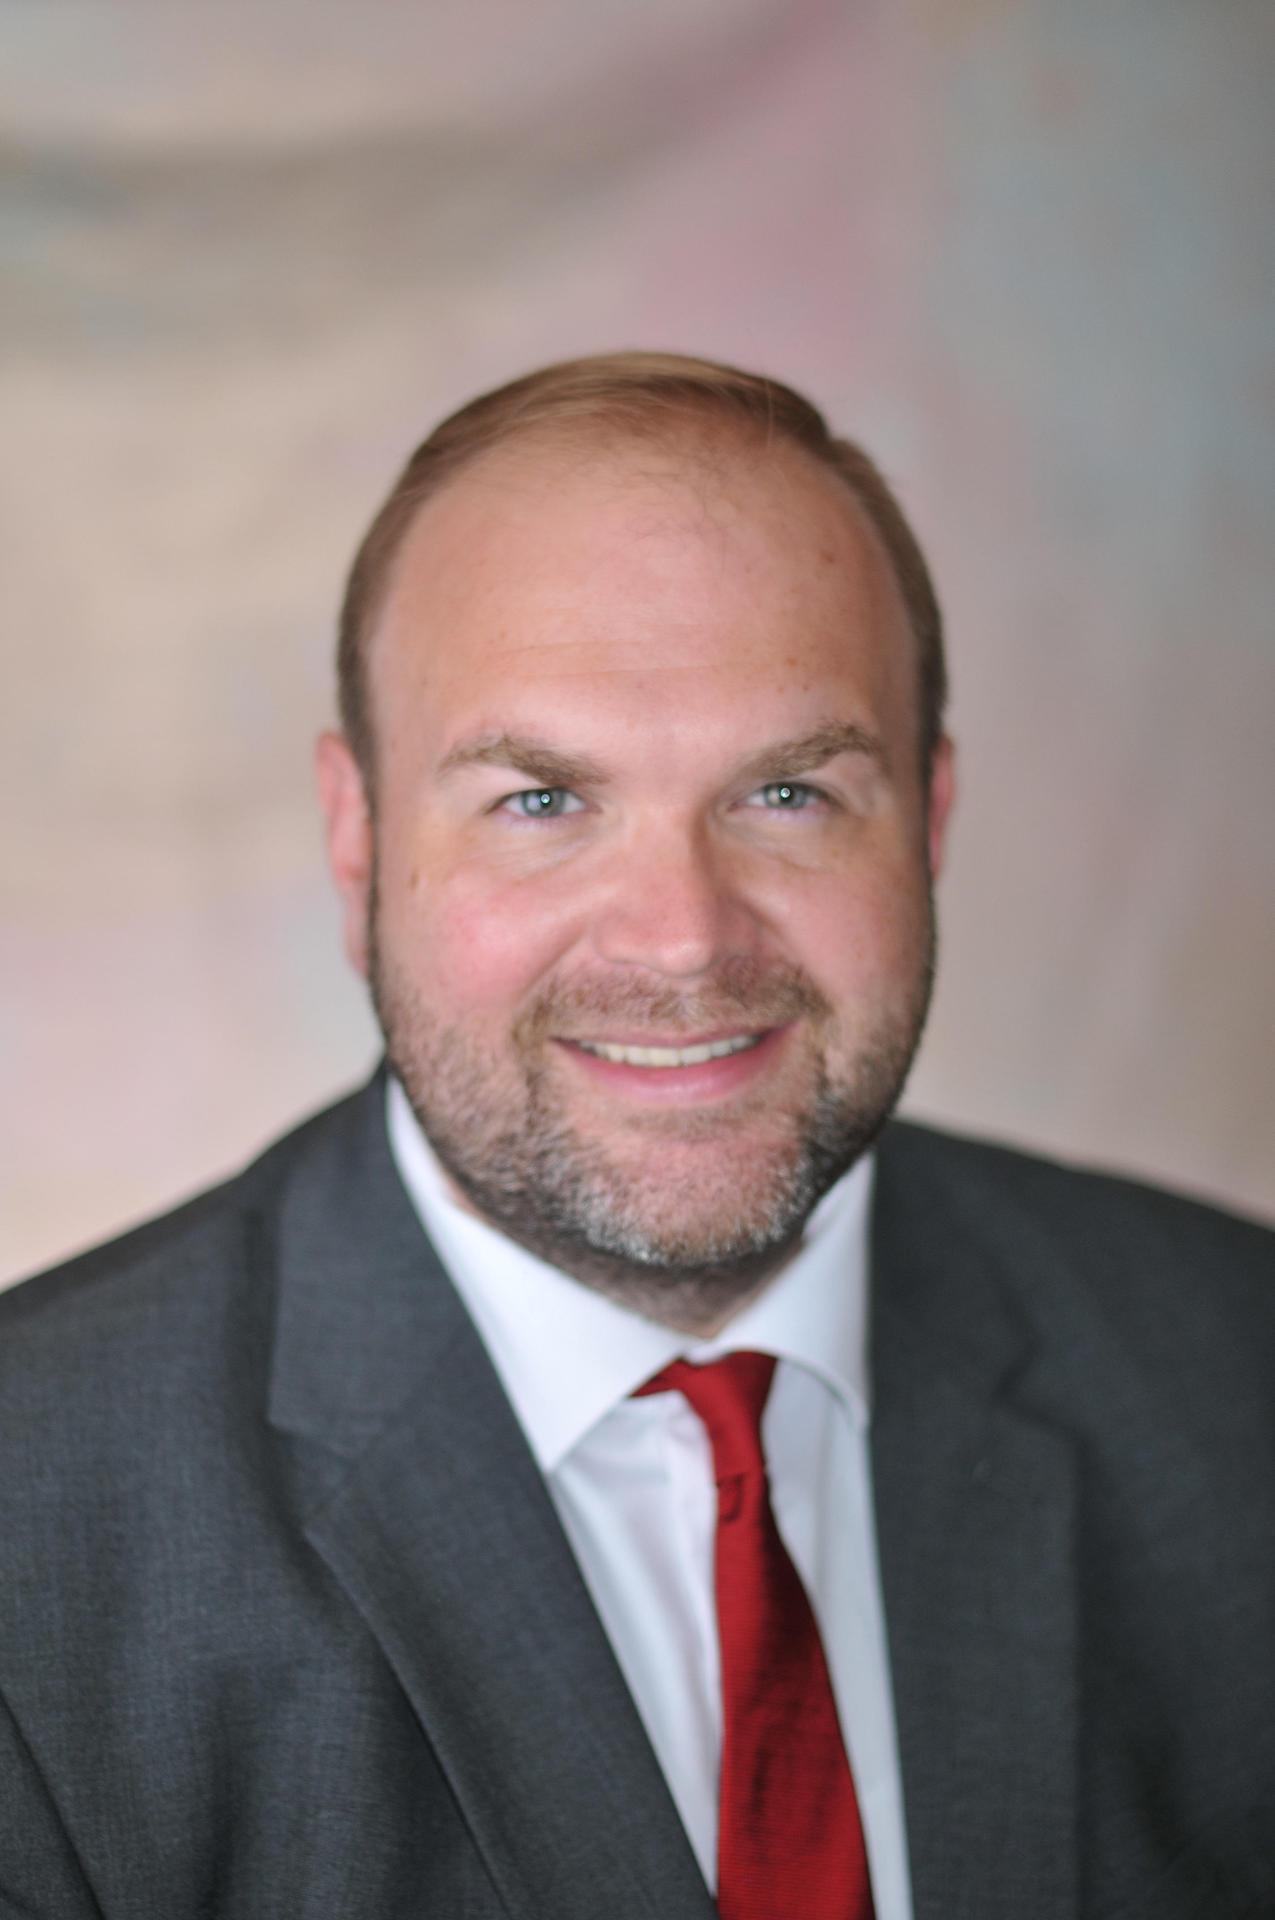 Dr. Brian S. Merritt